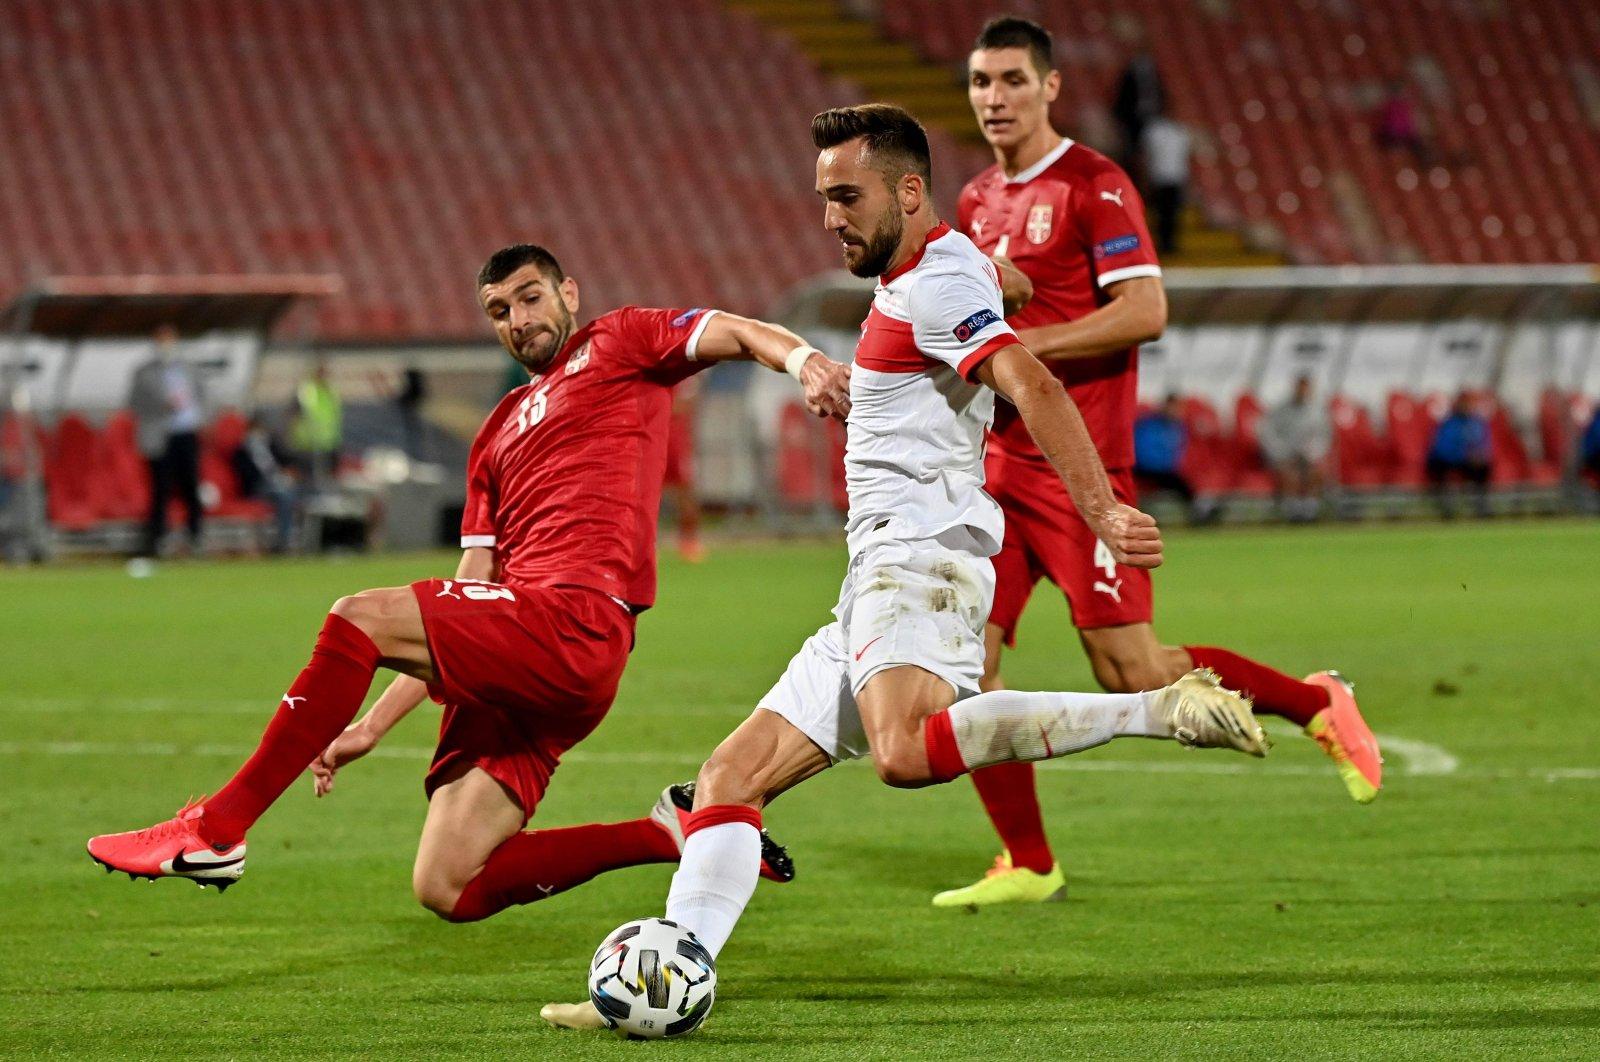 Turkey forward Kenan Karaman (C) shoots during the UEFA Nations League match against Serbia, in Belgrade, Serbia, Sept. 6, 2020. (AFP Photo)